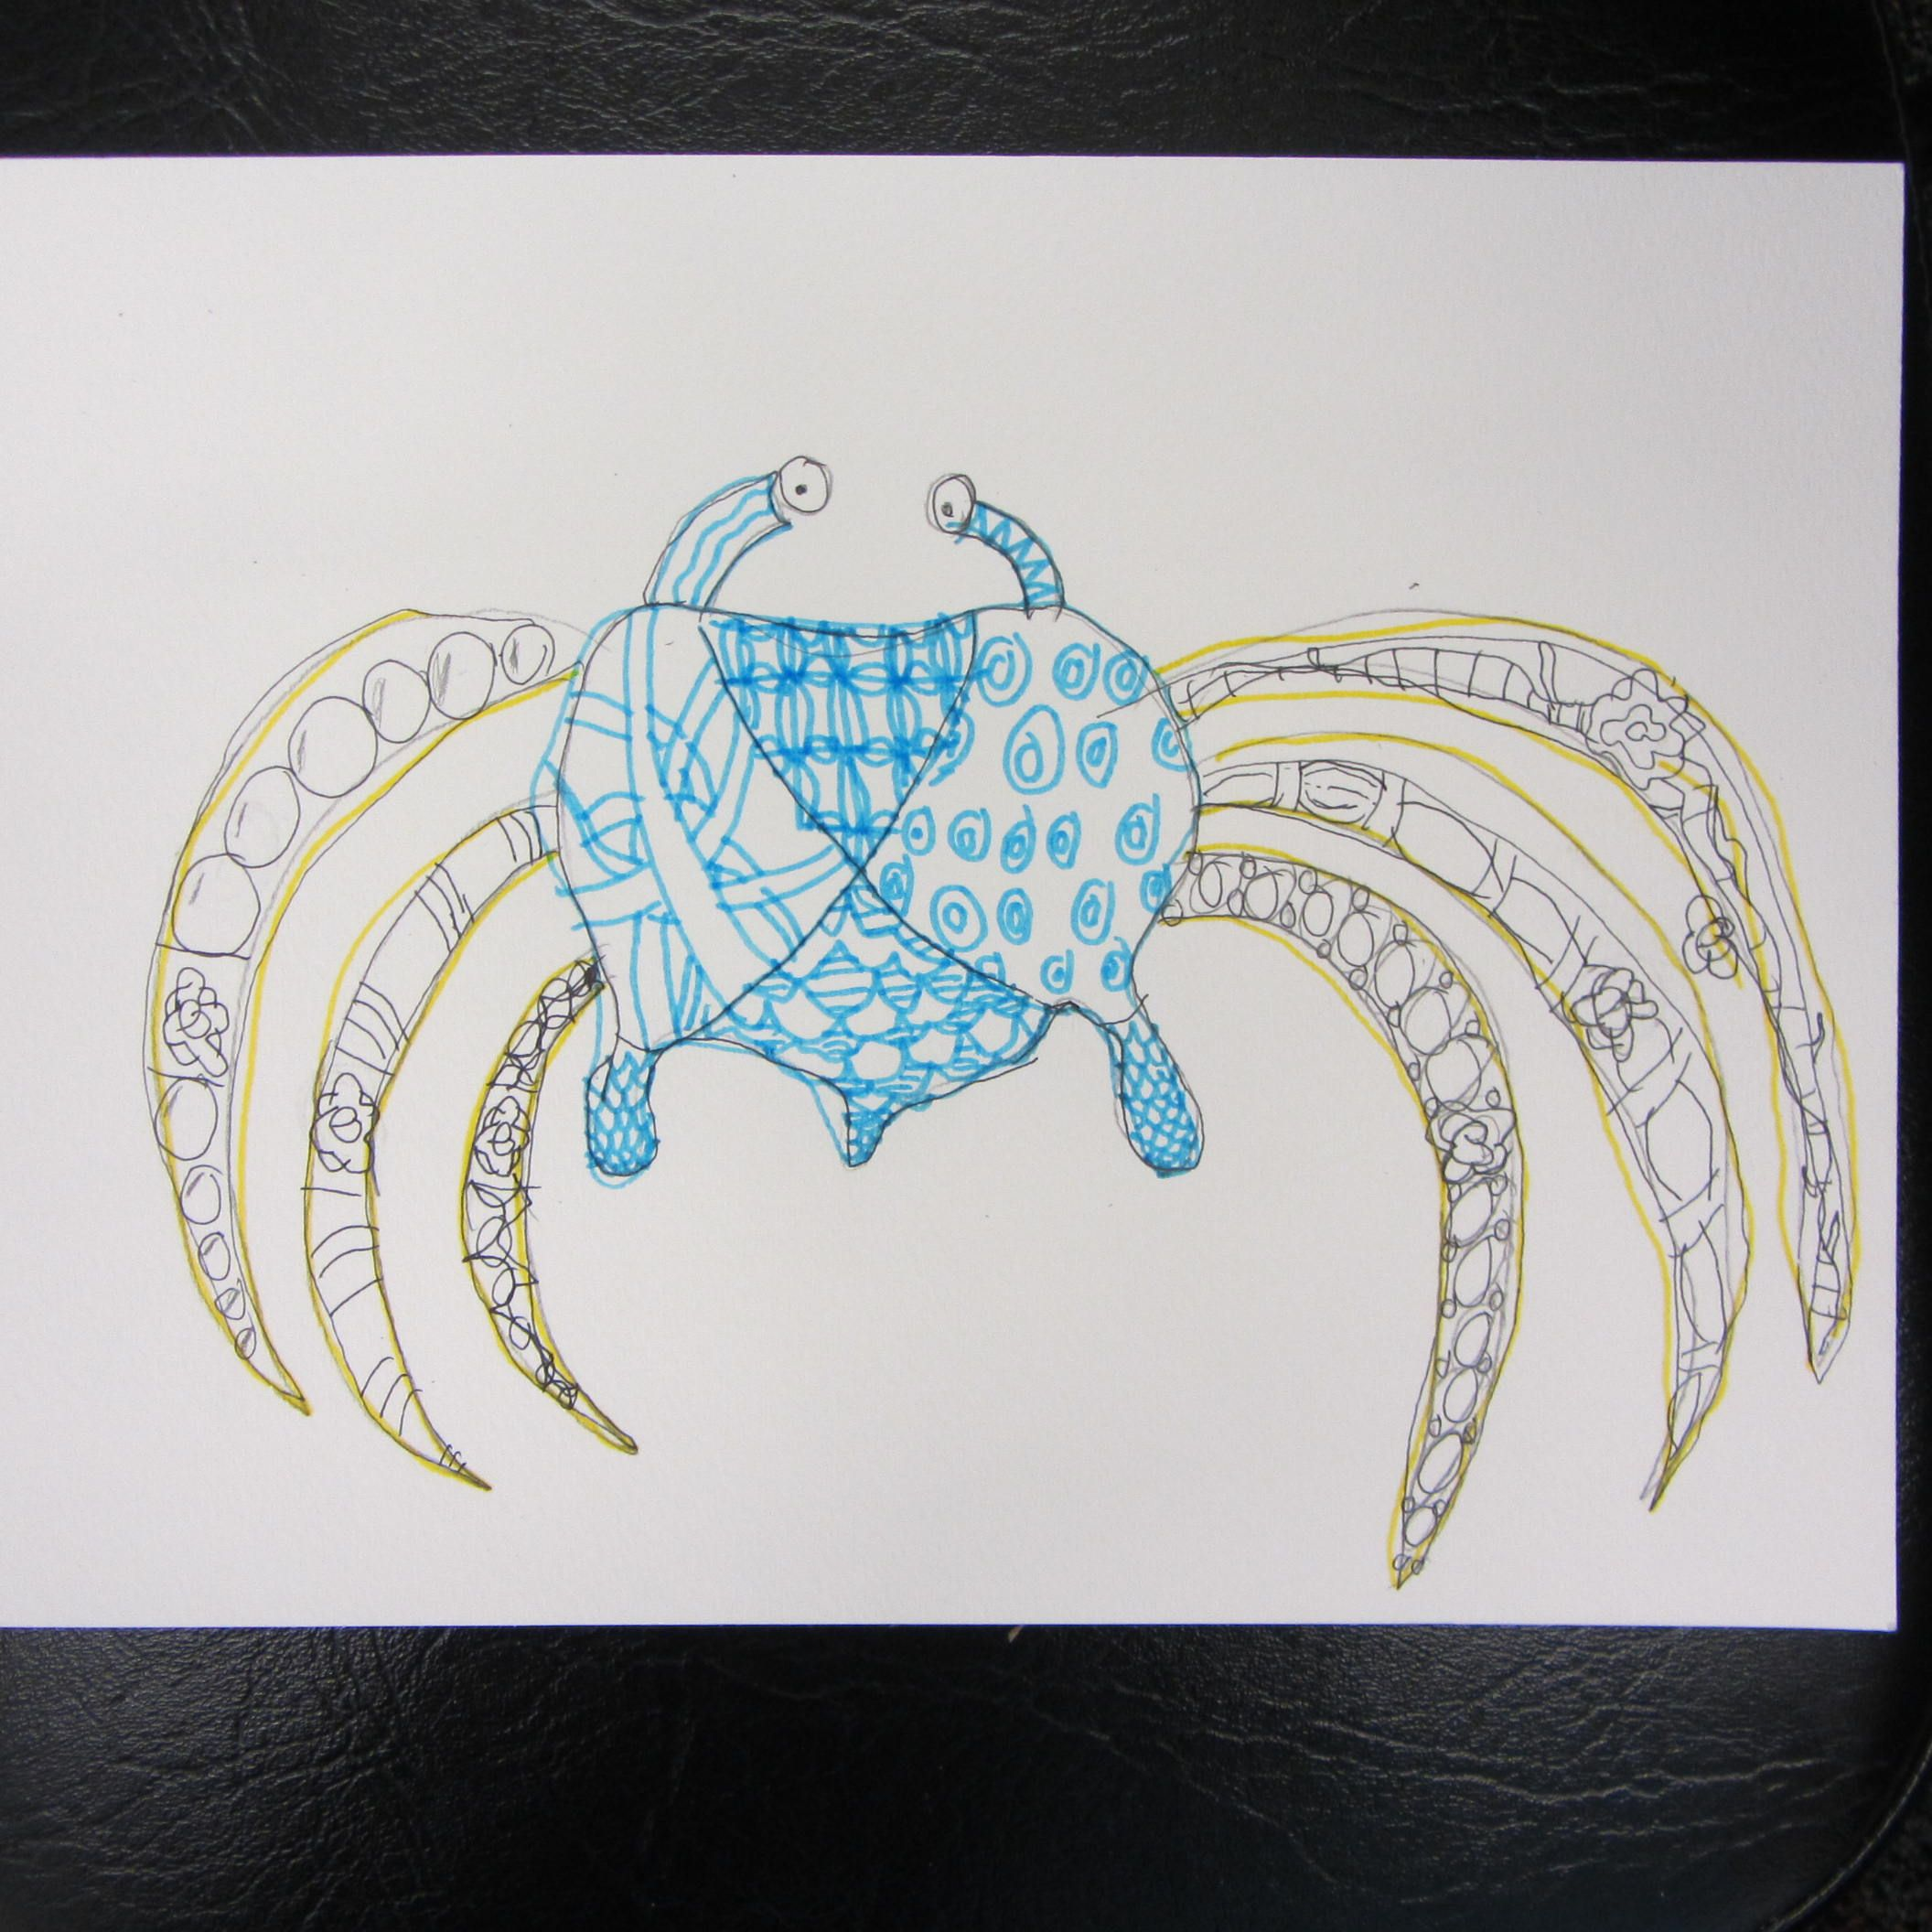 crab zentangle by Matthew of Zentangle Club